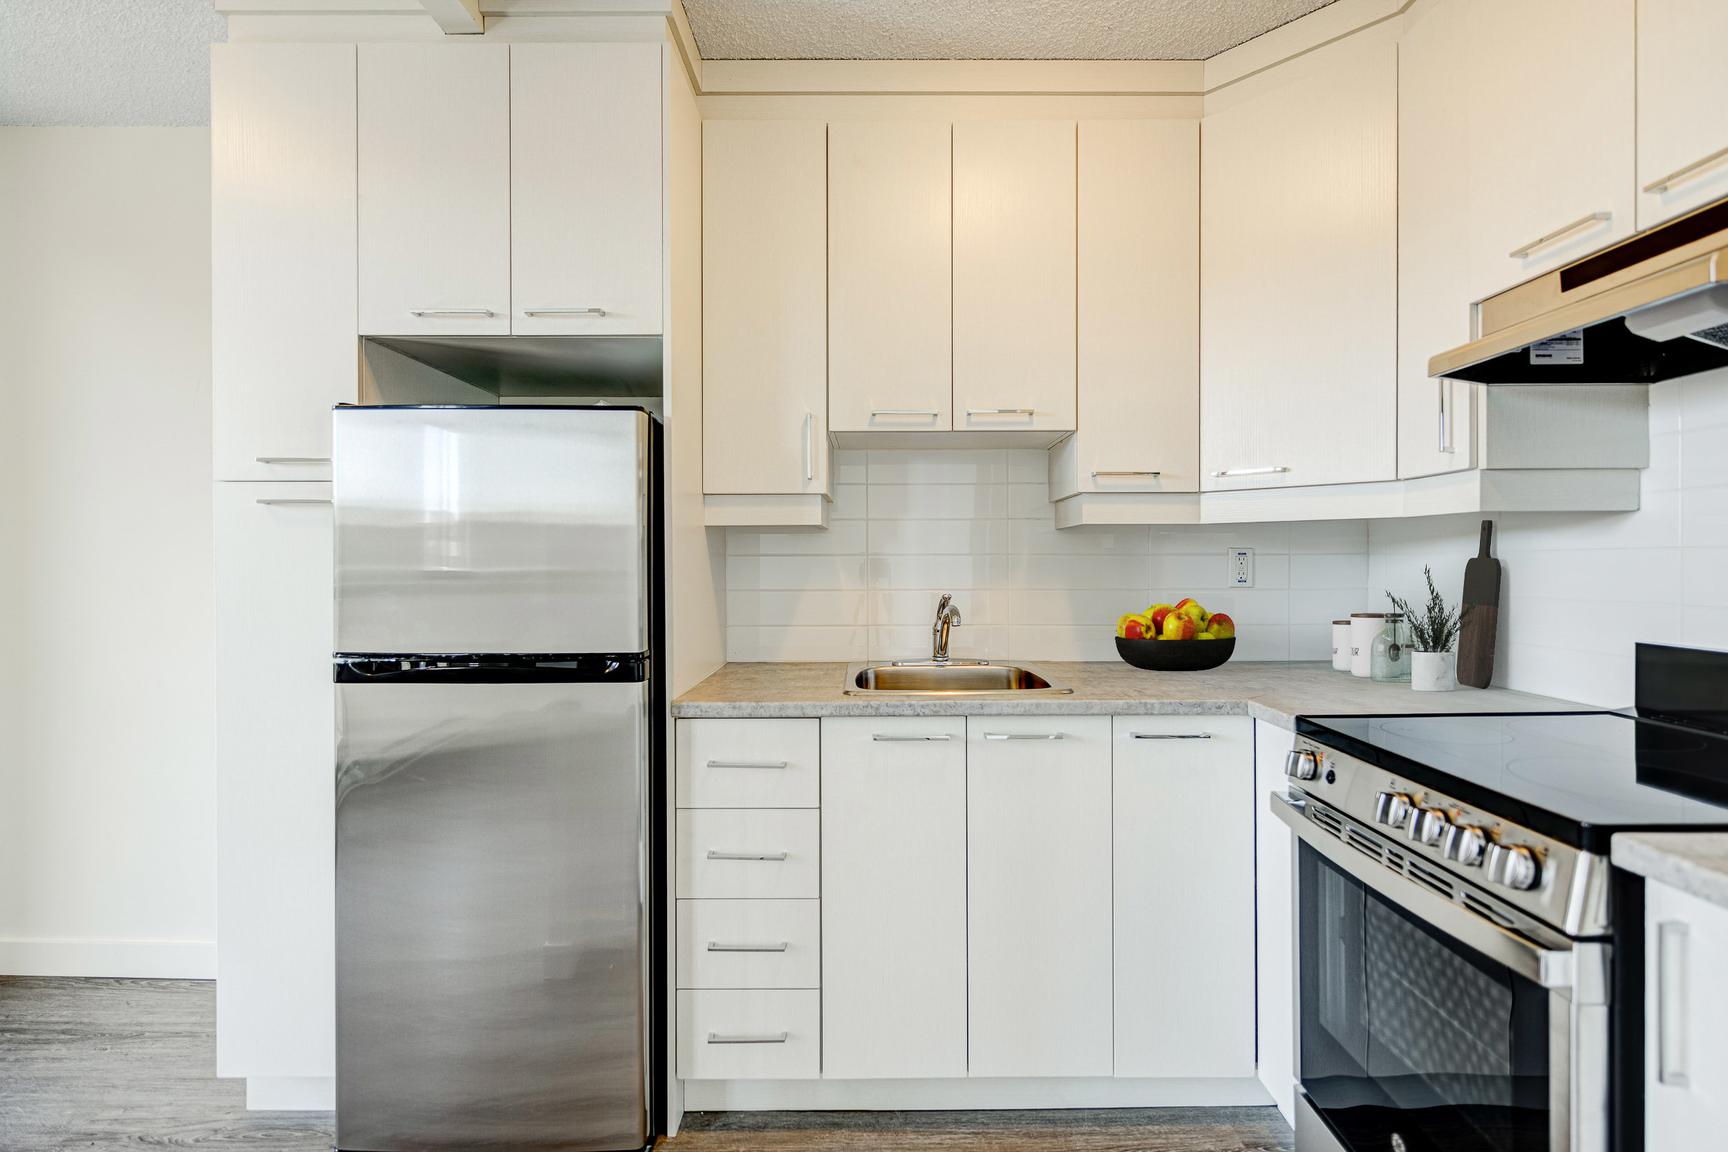 1 bedroom Apartments for rent in Laval at Le Quatre Cent - Photo 09 - RentersPages – L407183